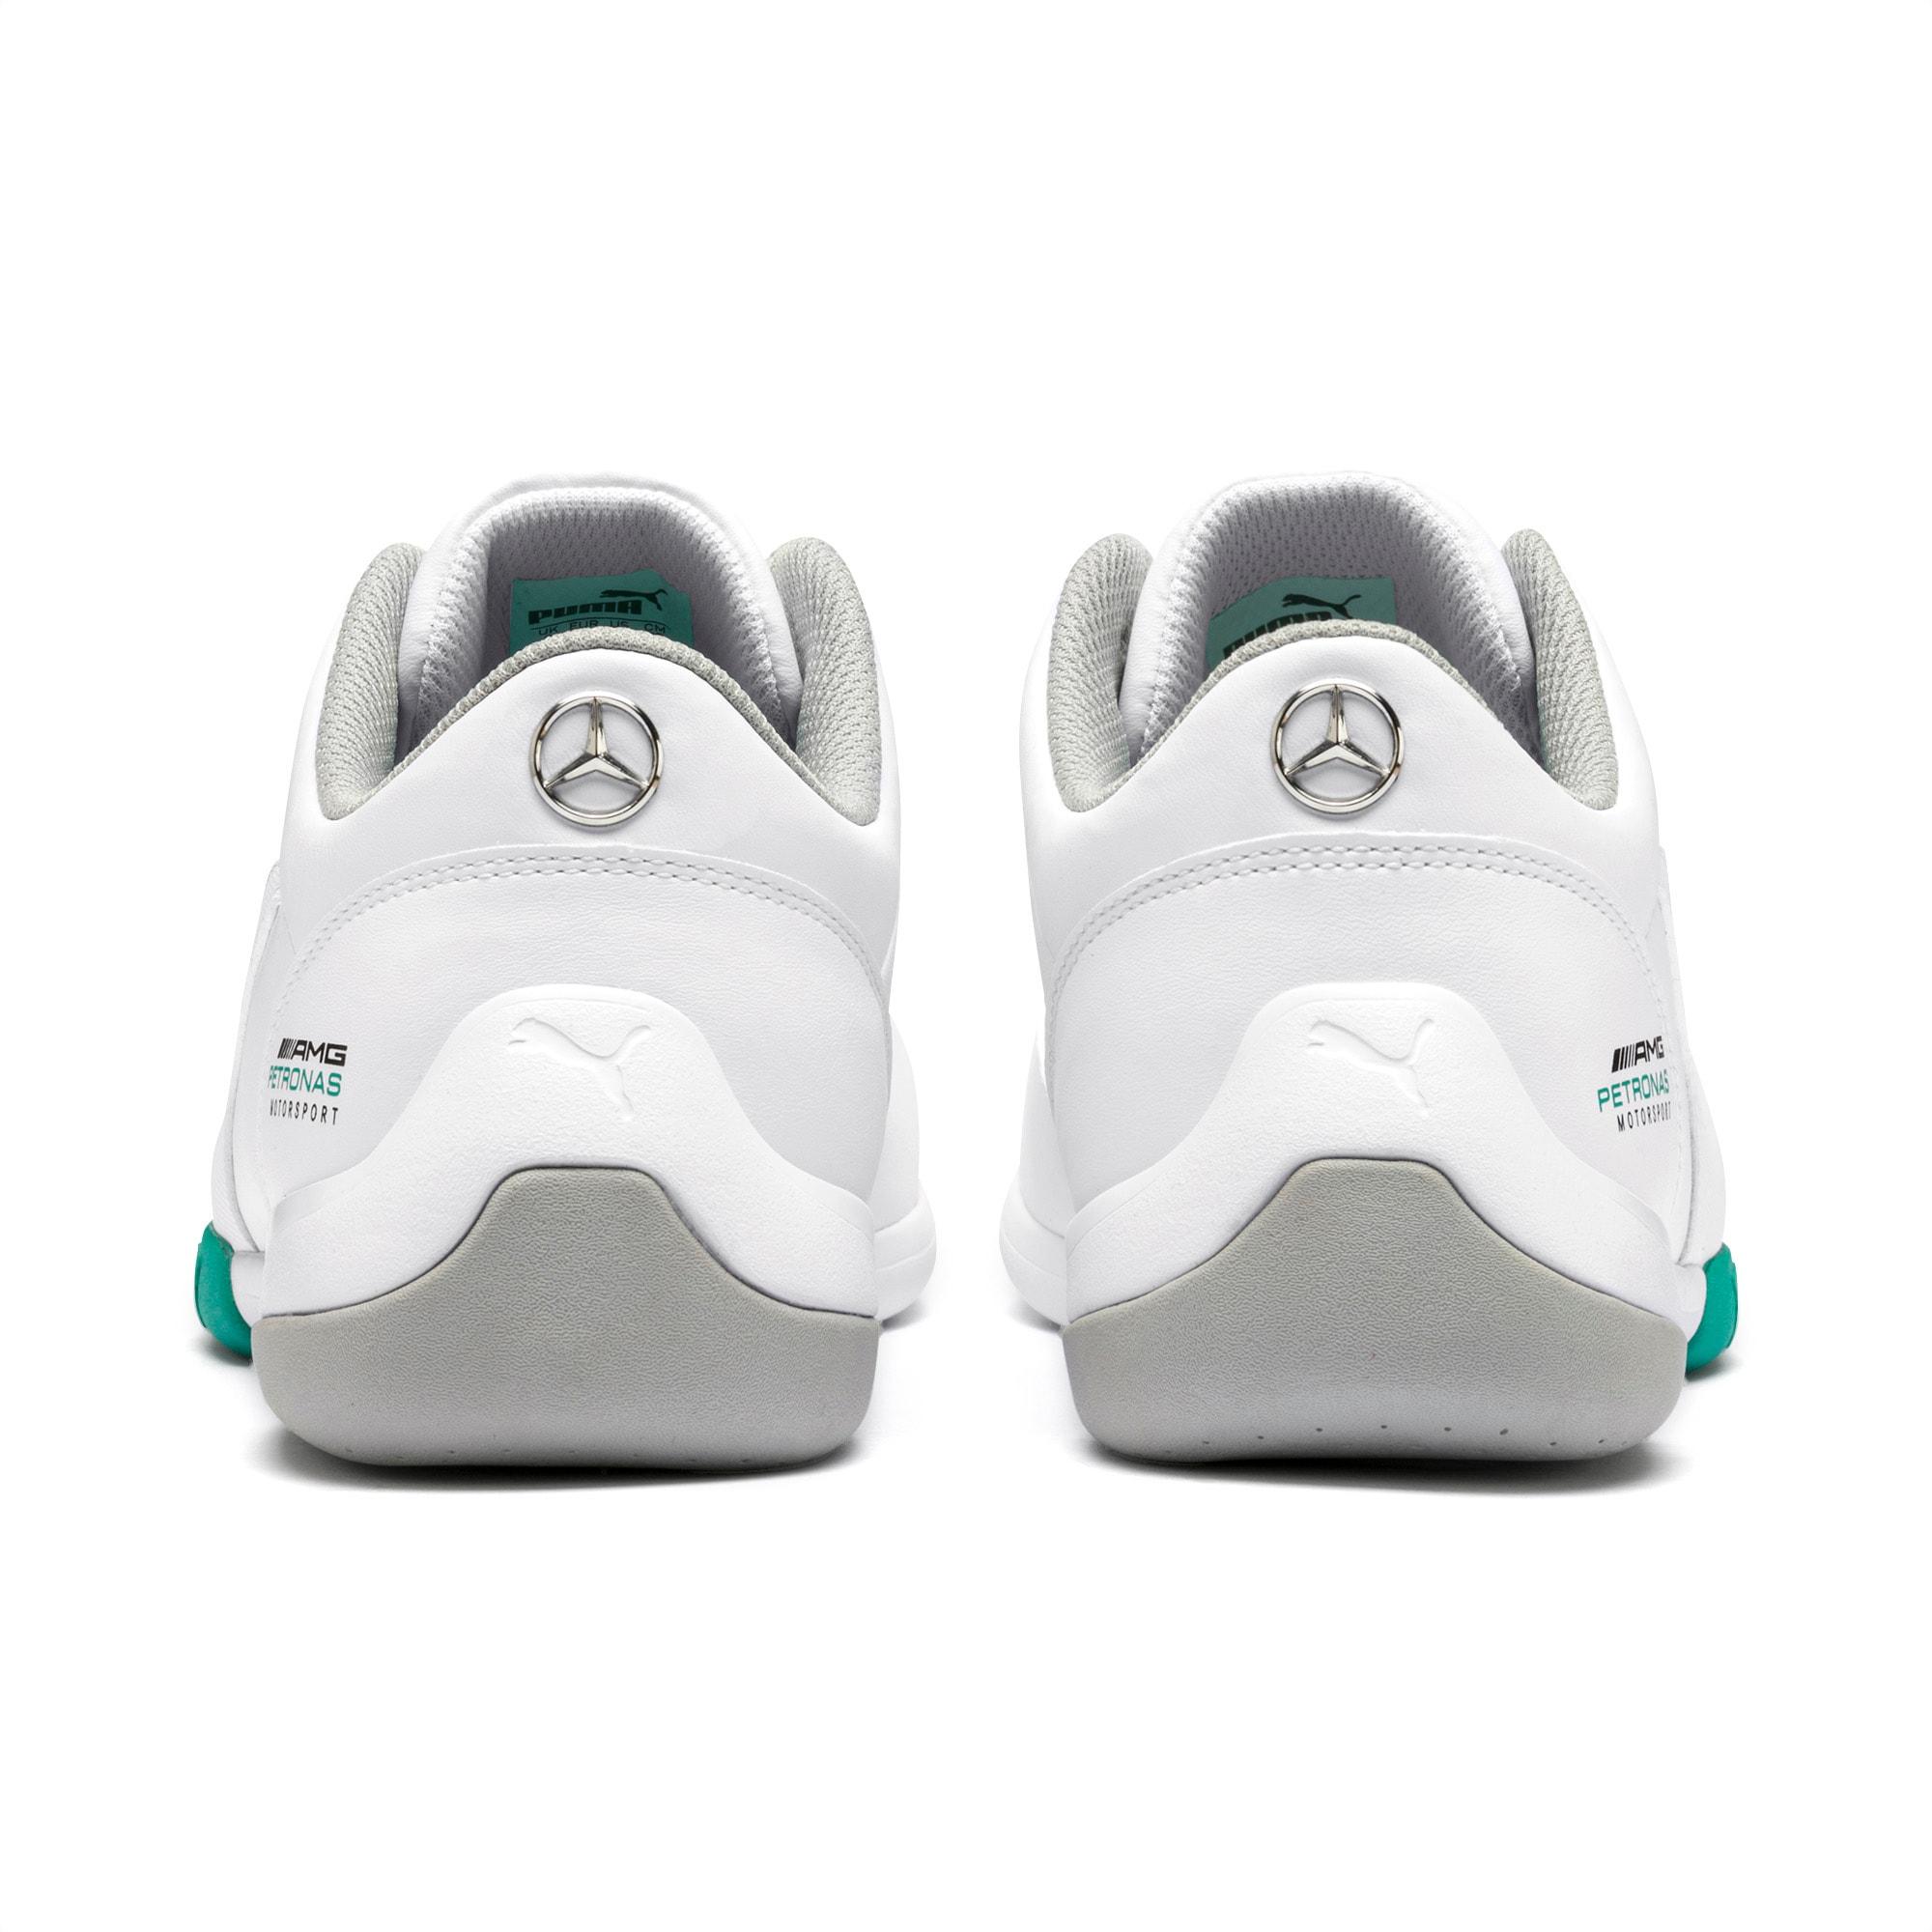 amg puma chaussure